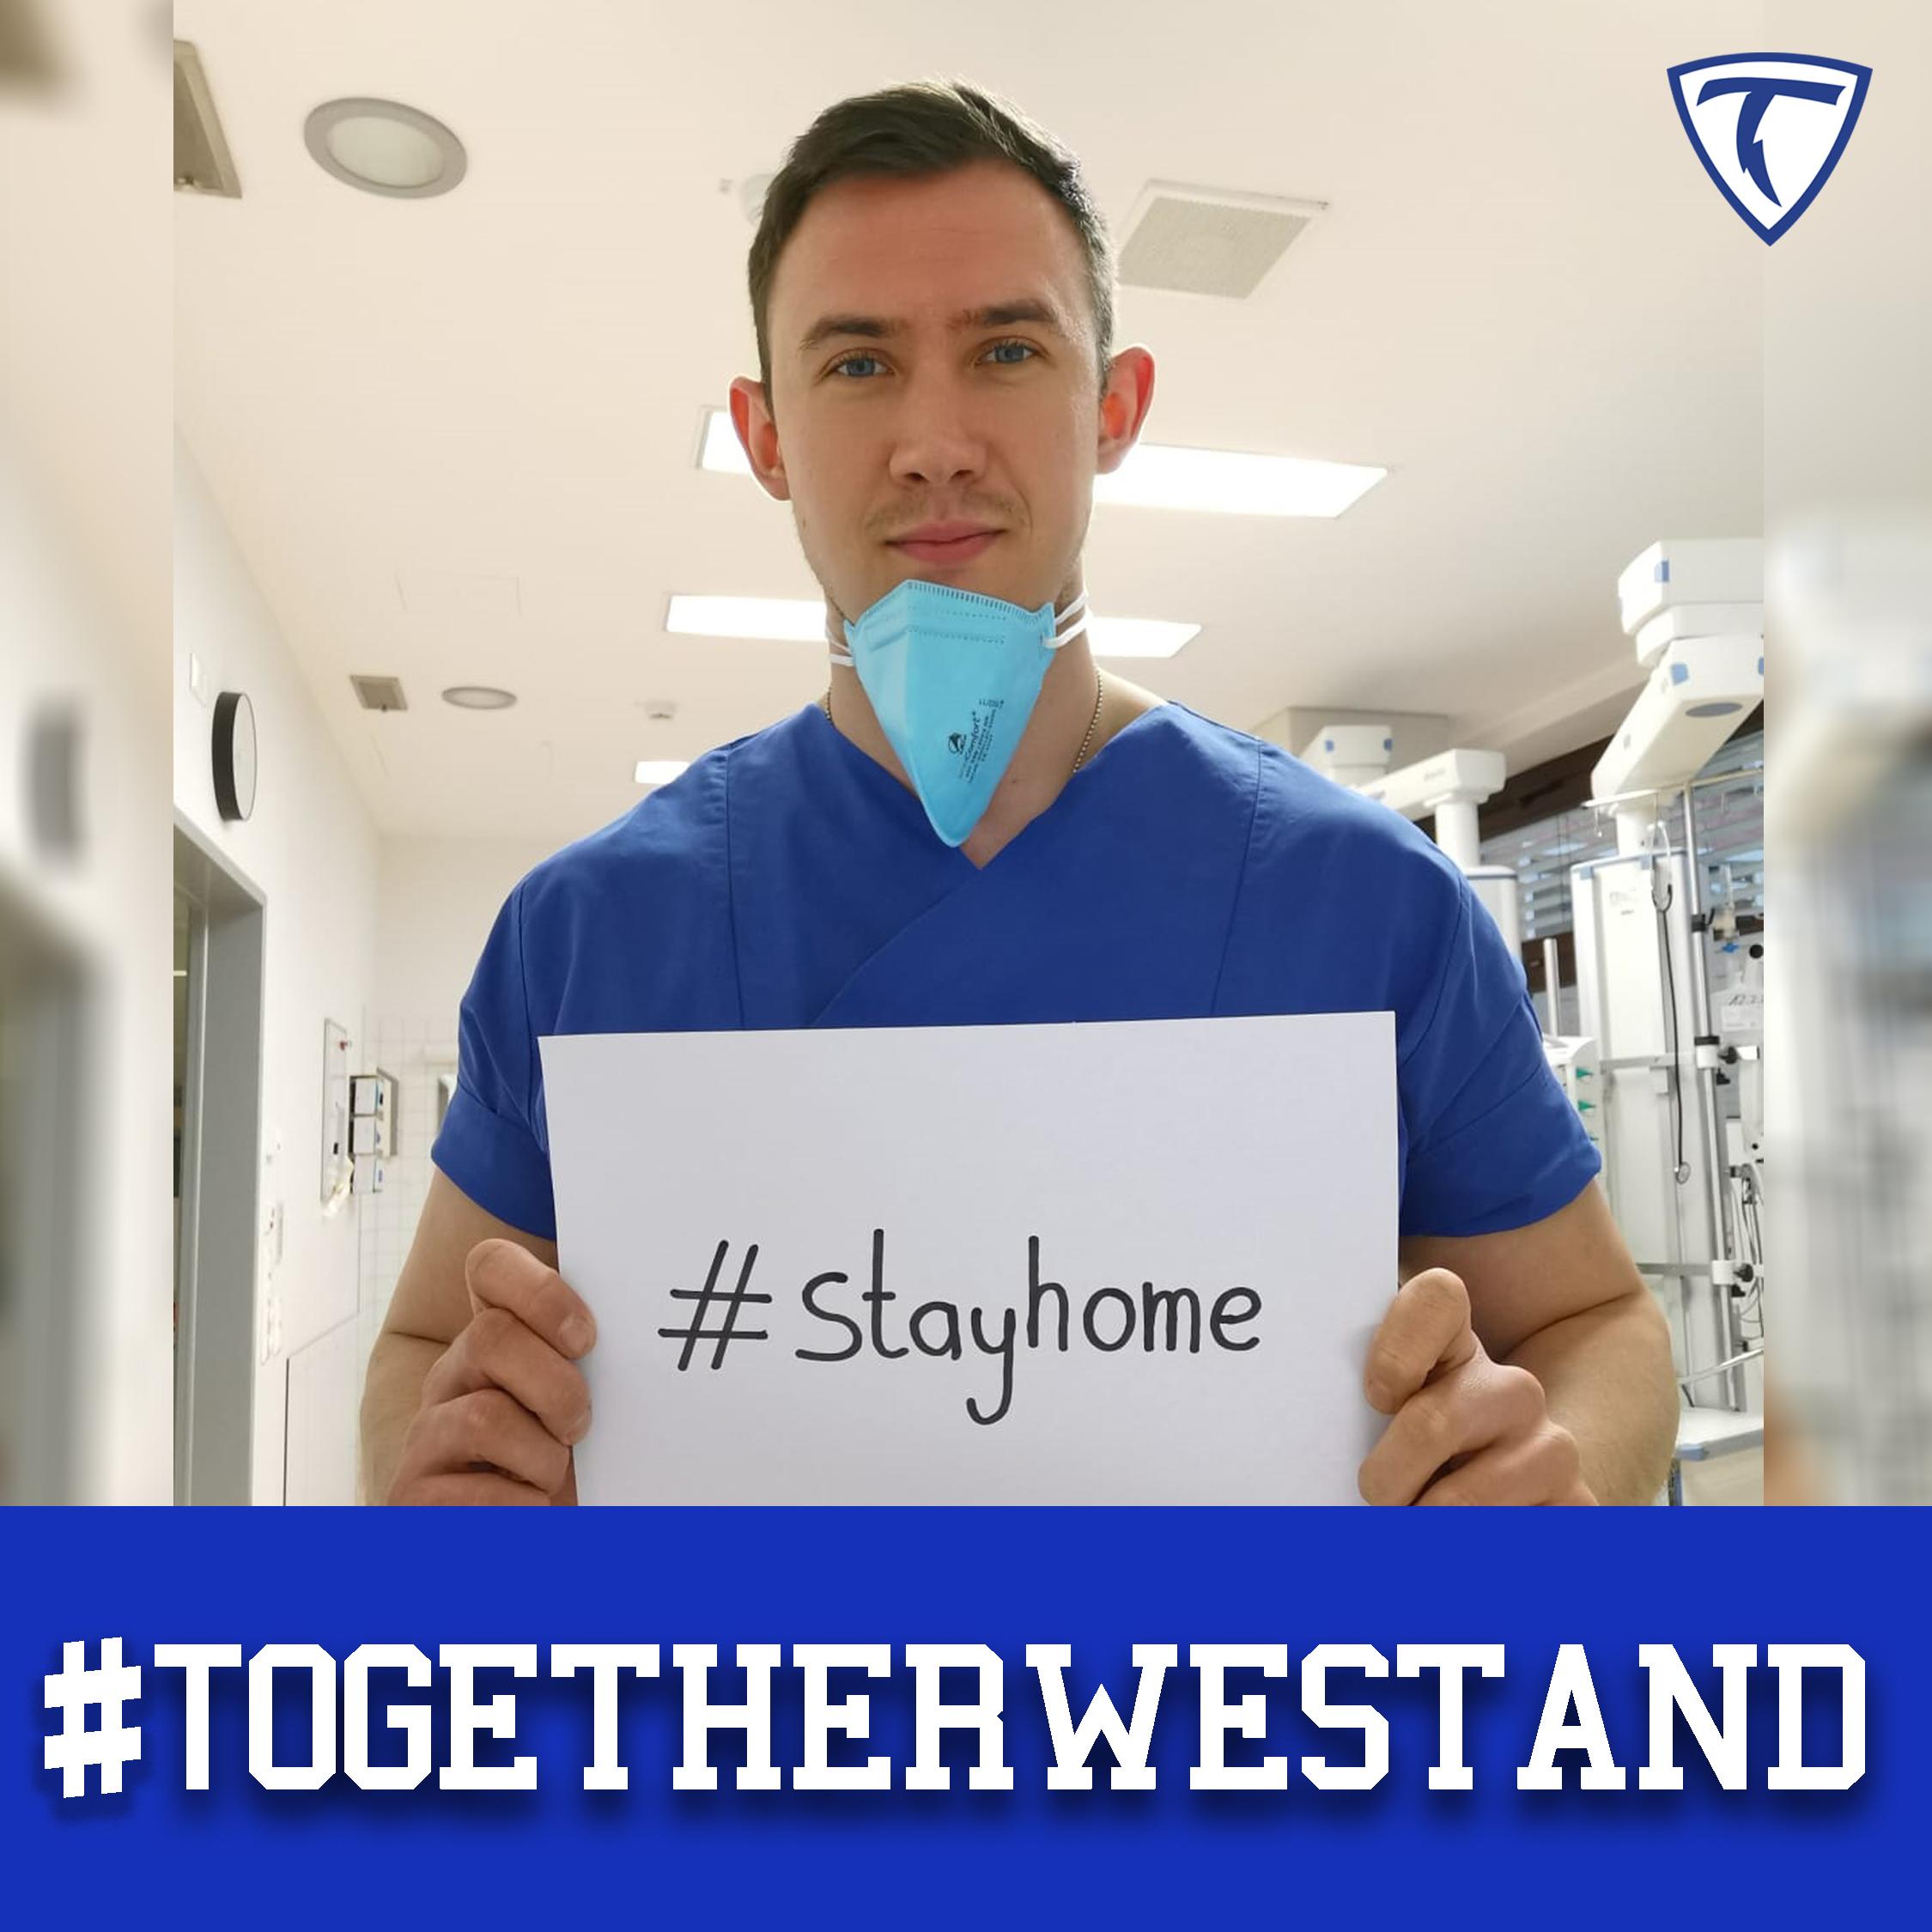 #STAYHOME, COVID-19